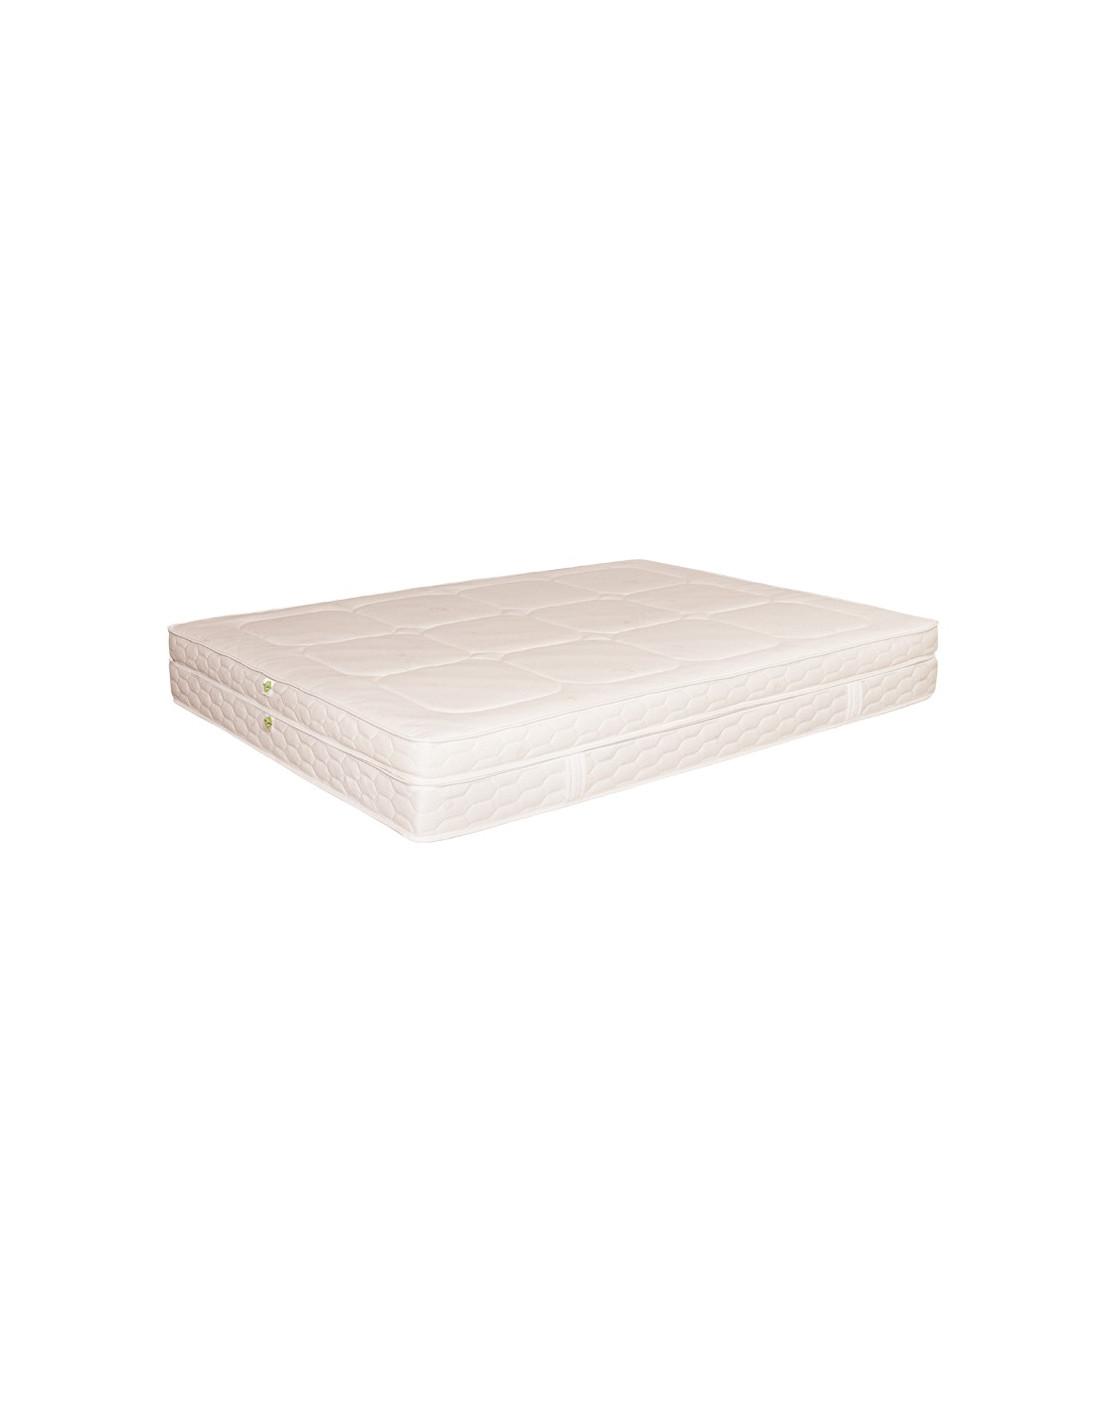 surmatelas vegan emelys 2 latex naturel noct a. Black Bedroom Furniture Sets. Home Design Ideas